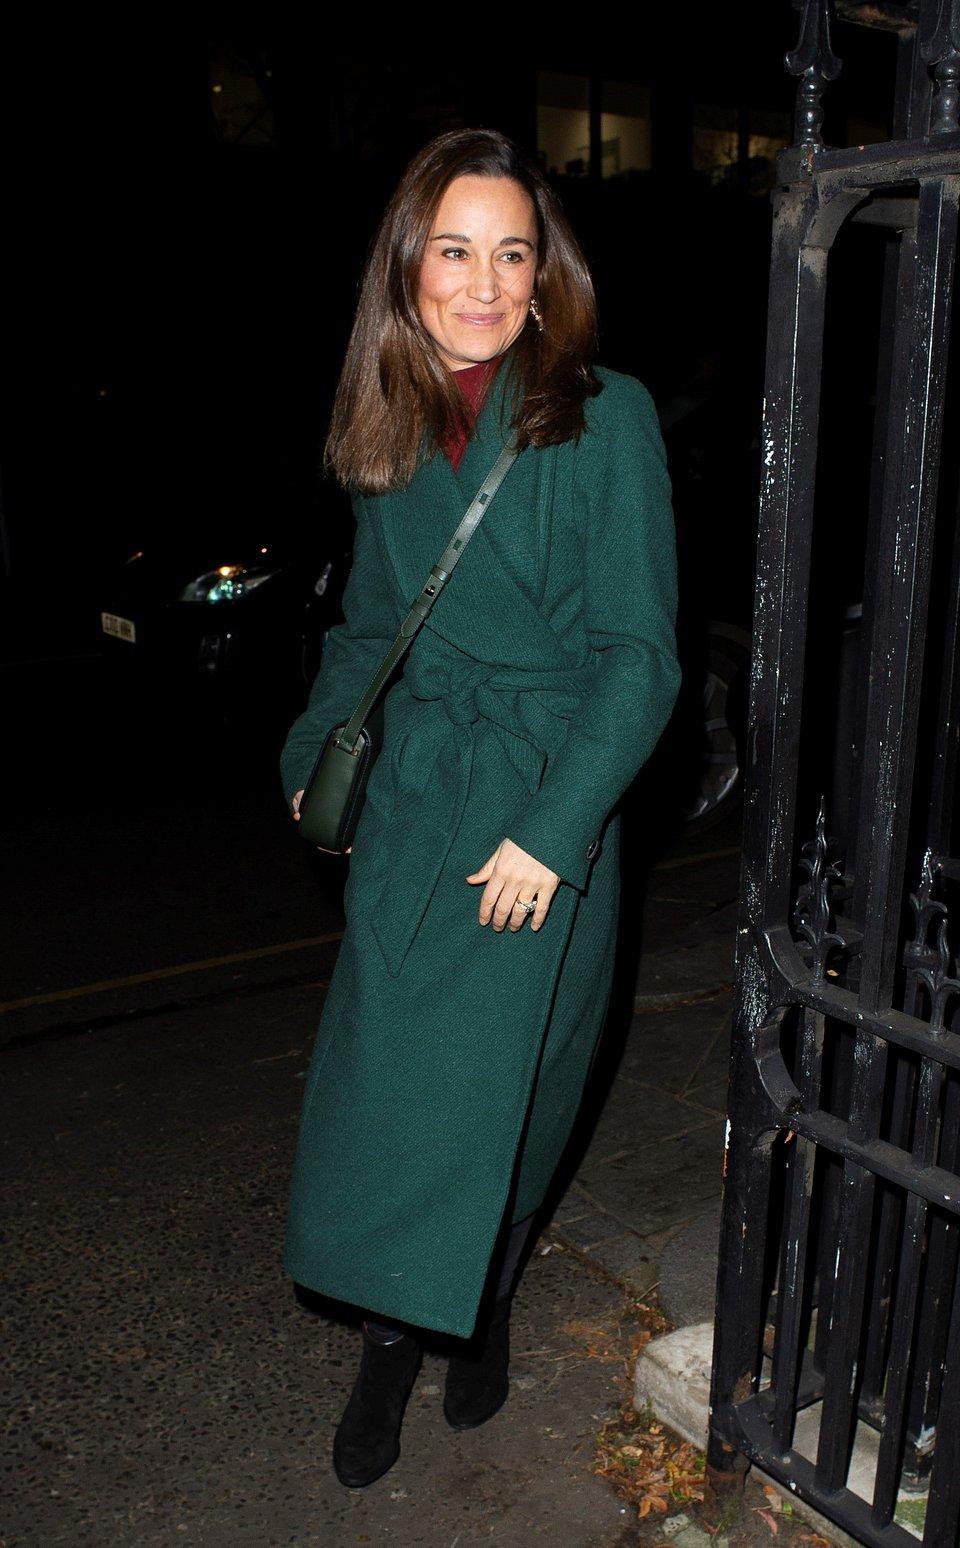 Pippa Middleton Mango coat-Right from GOFF 05122019.jpg